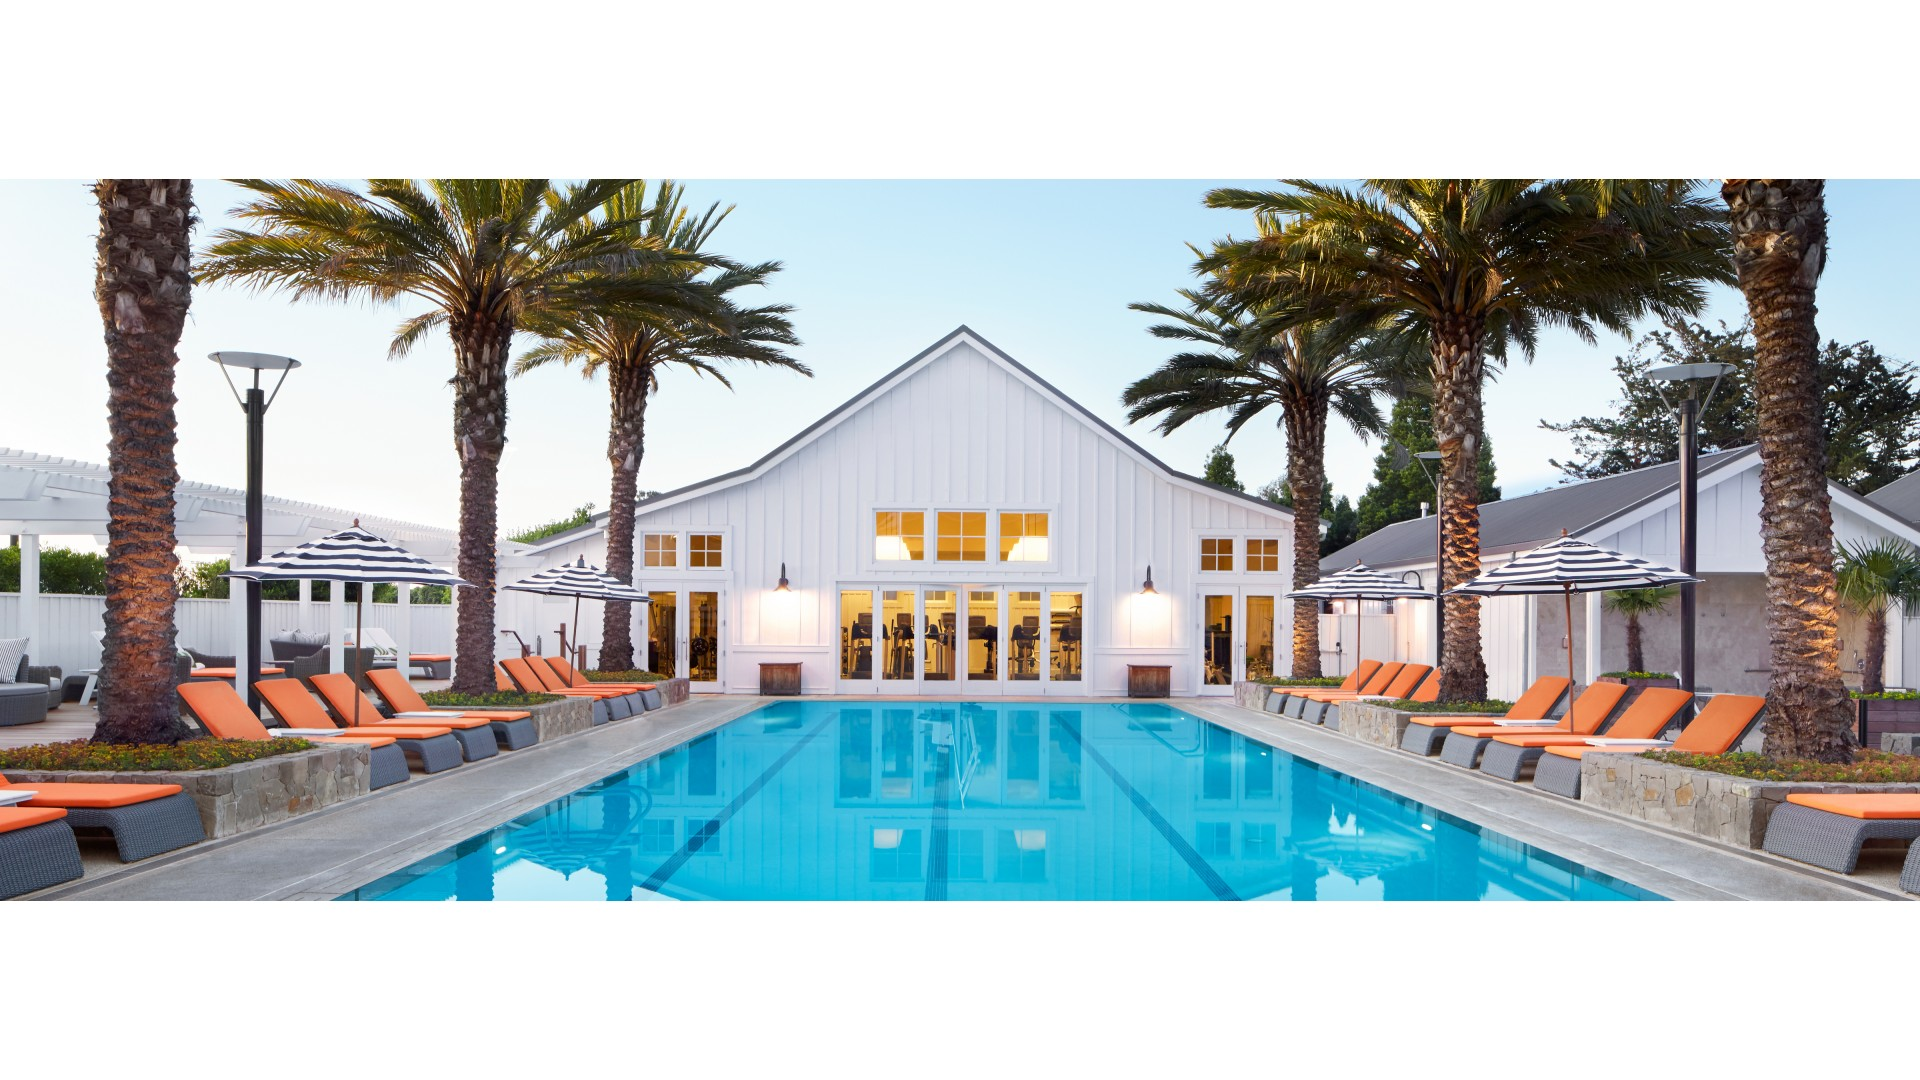 Carneros Resort and Spa hotel - California Wine Country - California ...